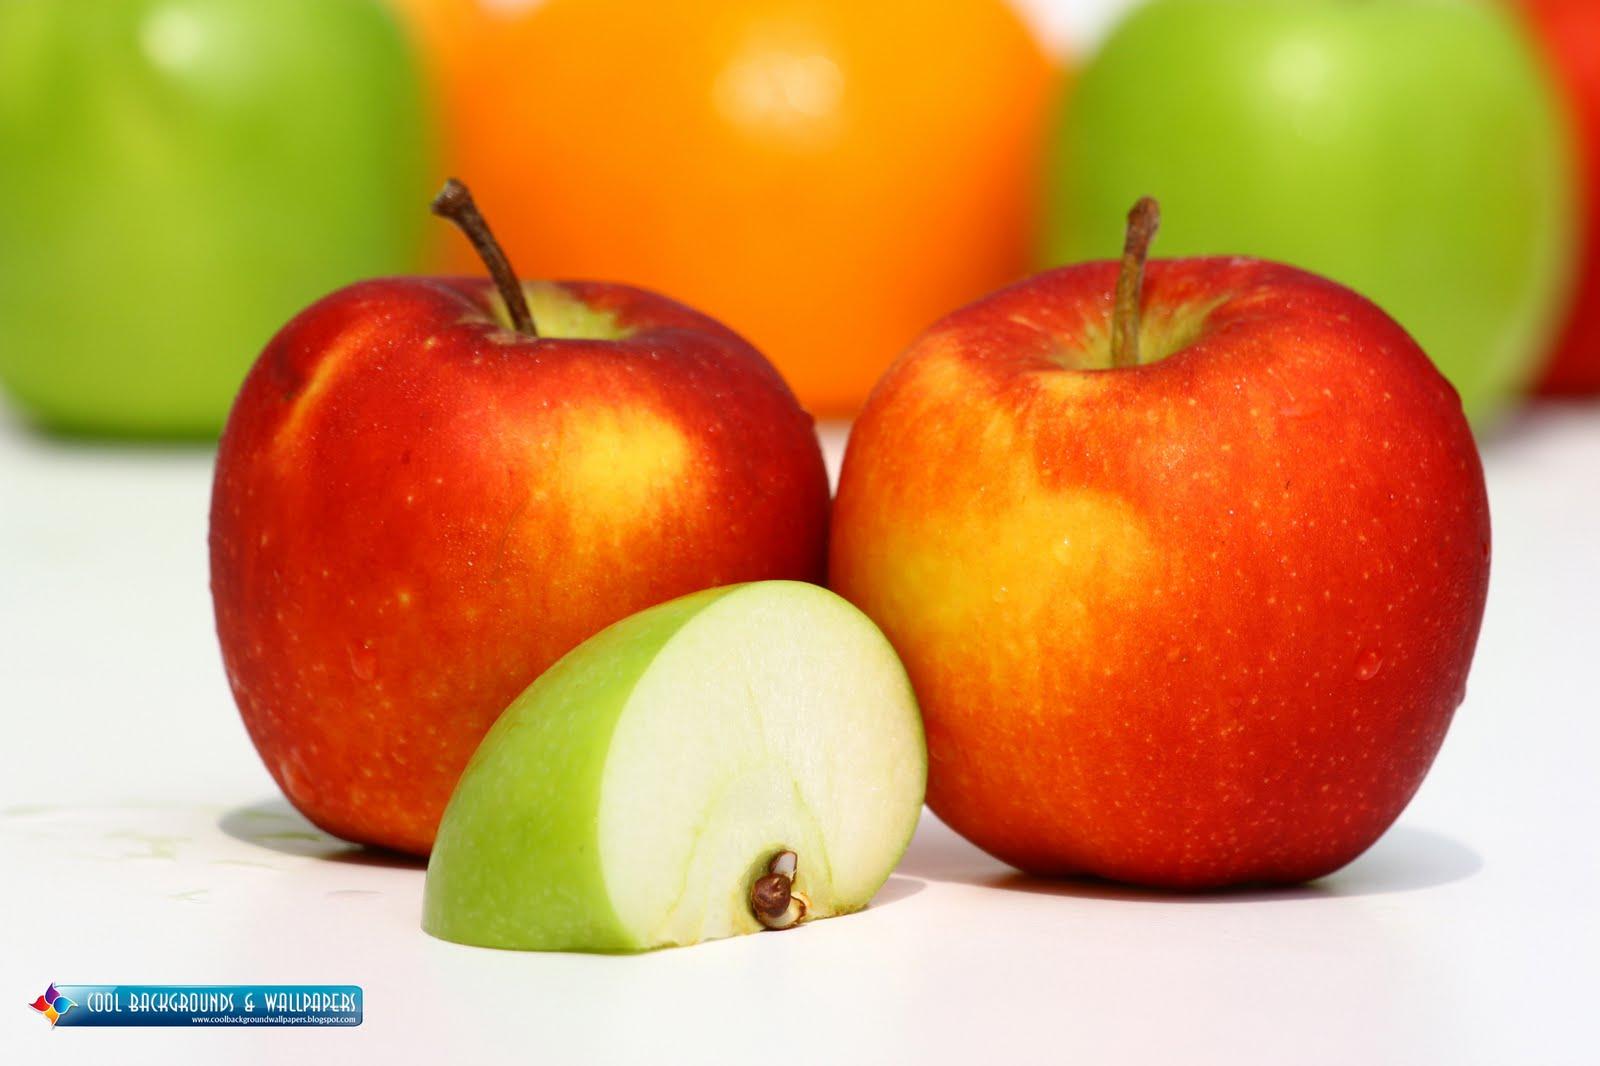 Qq Wallpapers Fresh Apples Hd Wallpaper